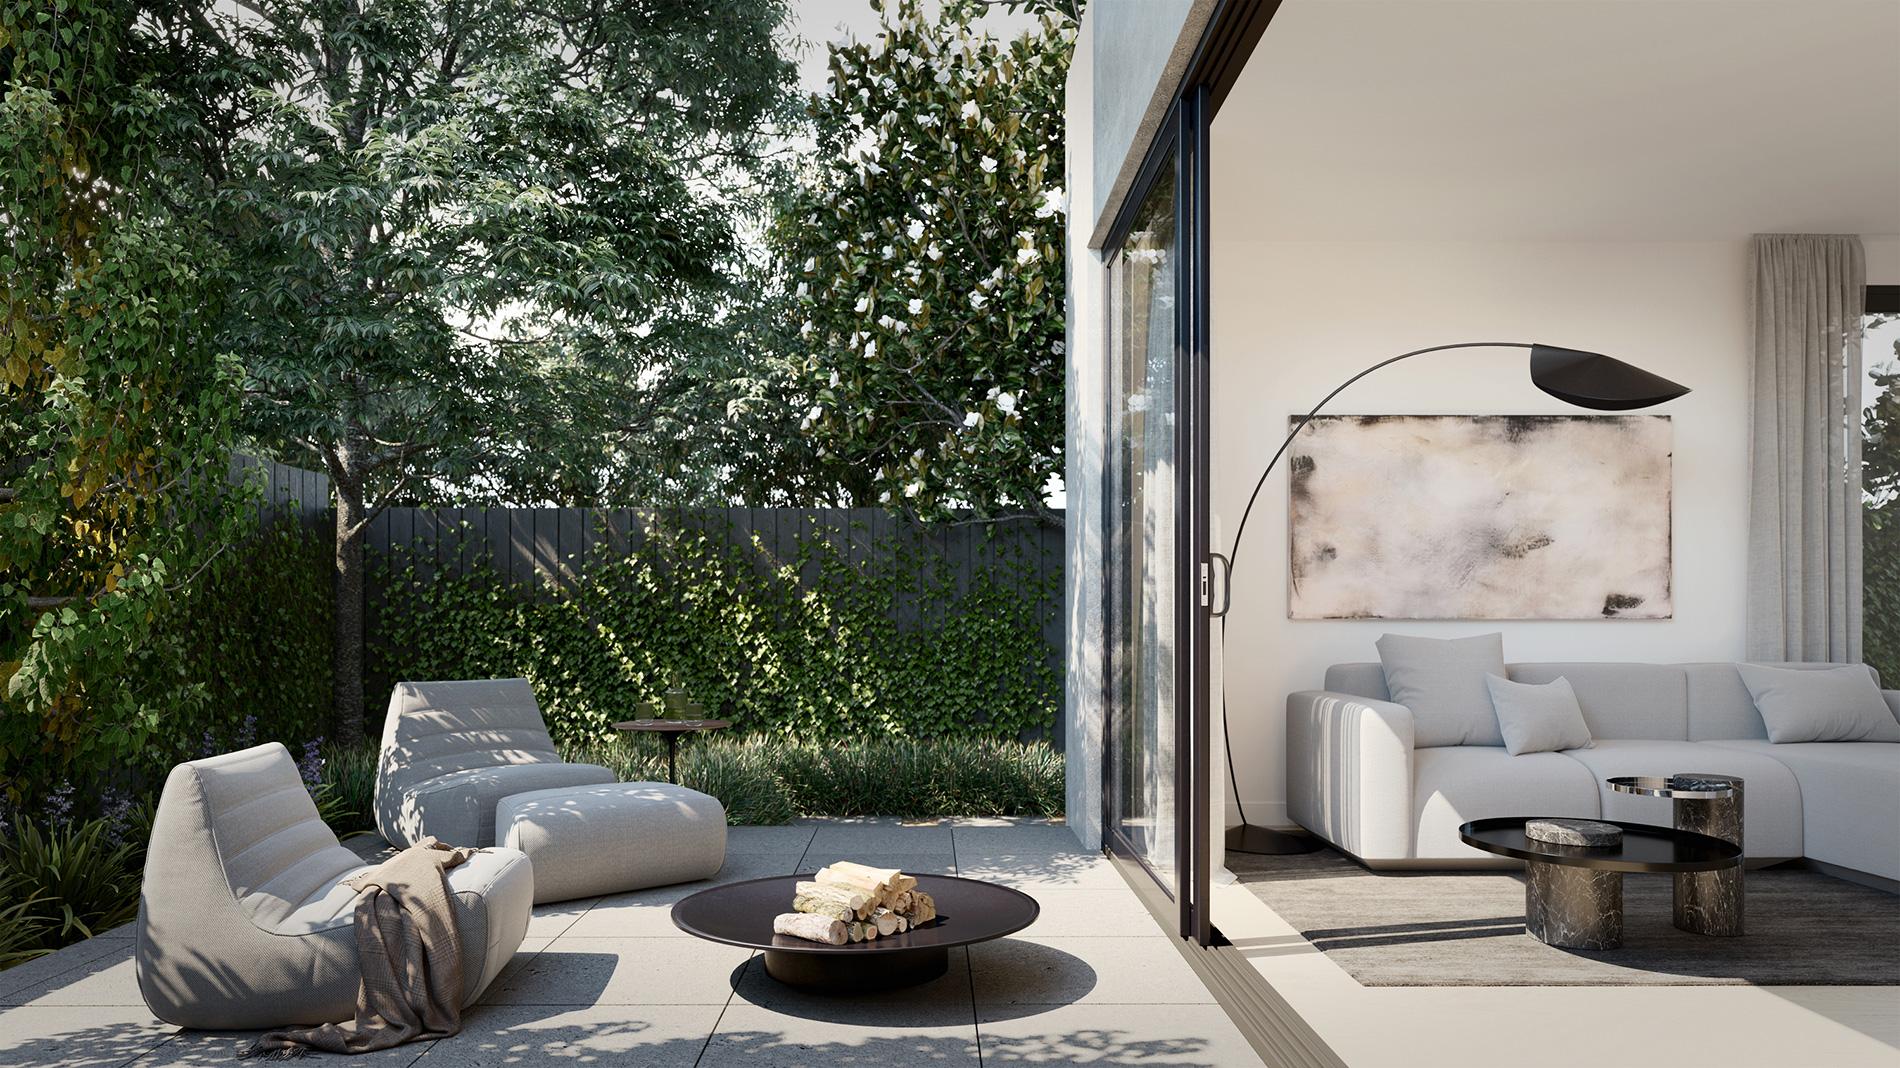 balwyn-townhouses-ckairouz-architects-outdoor-terrace-yard-livingroom